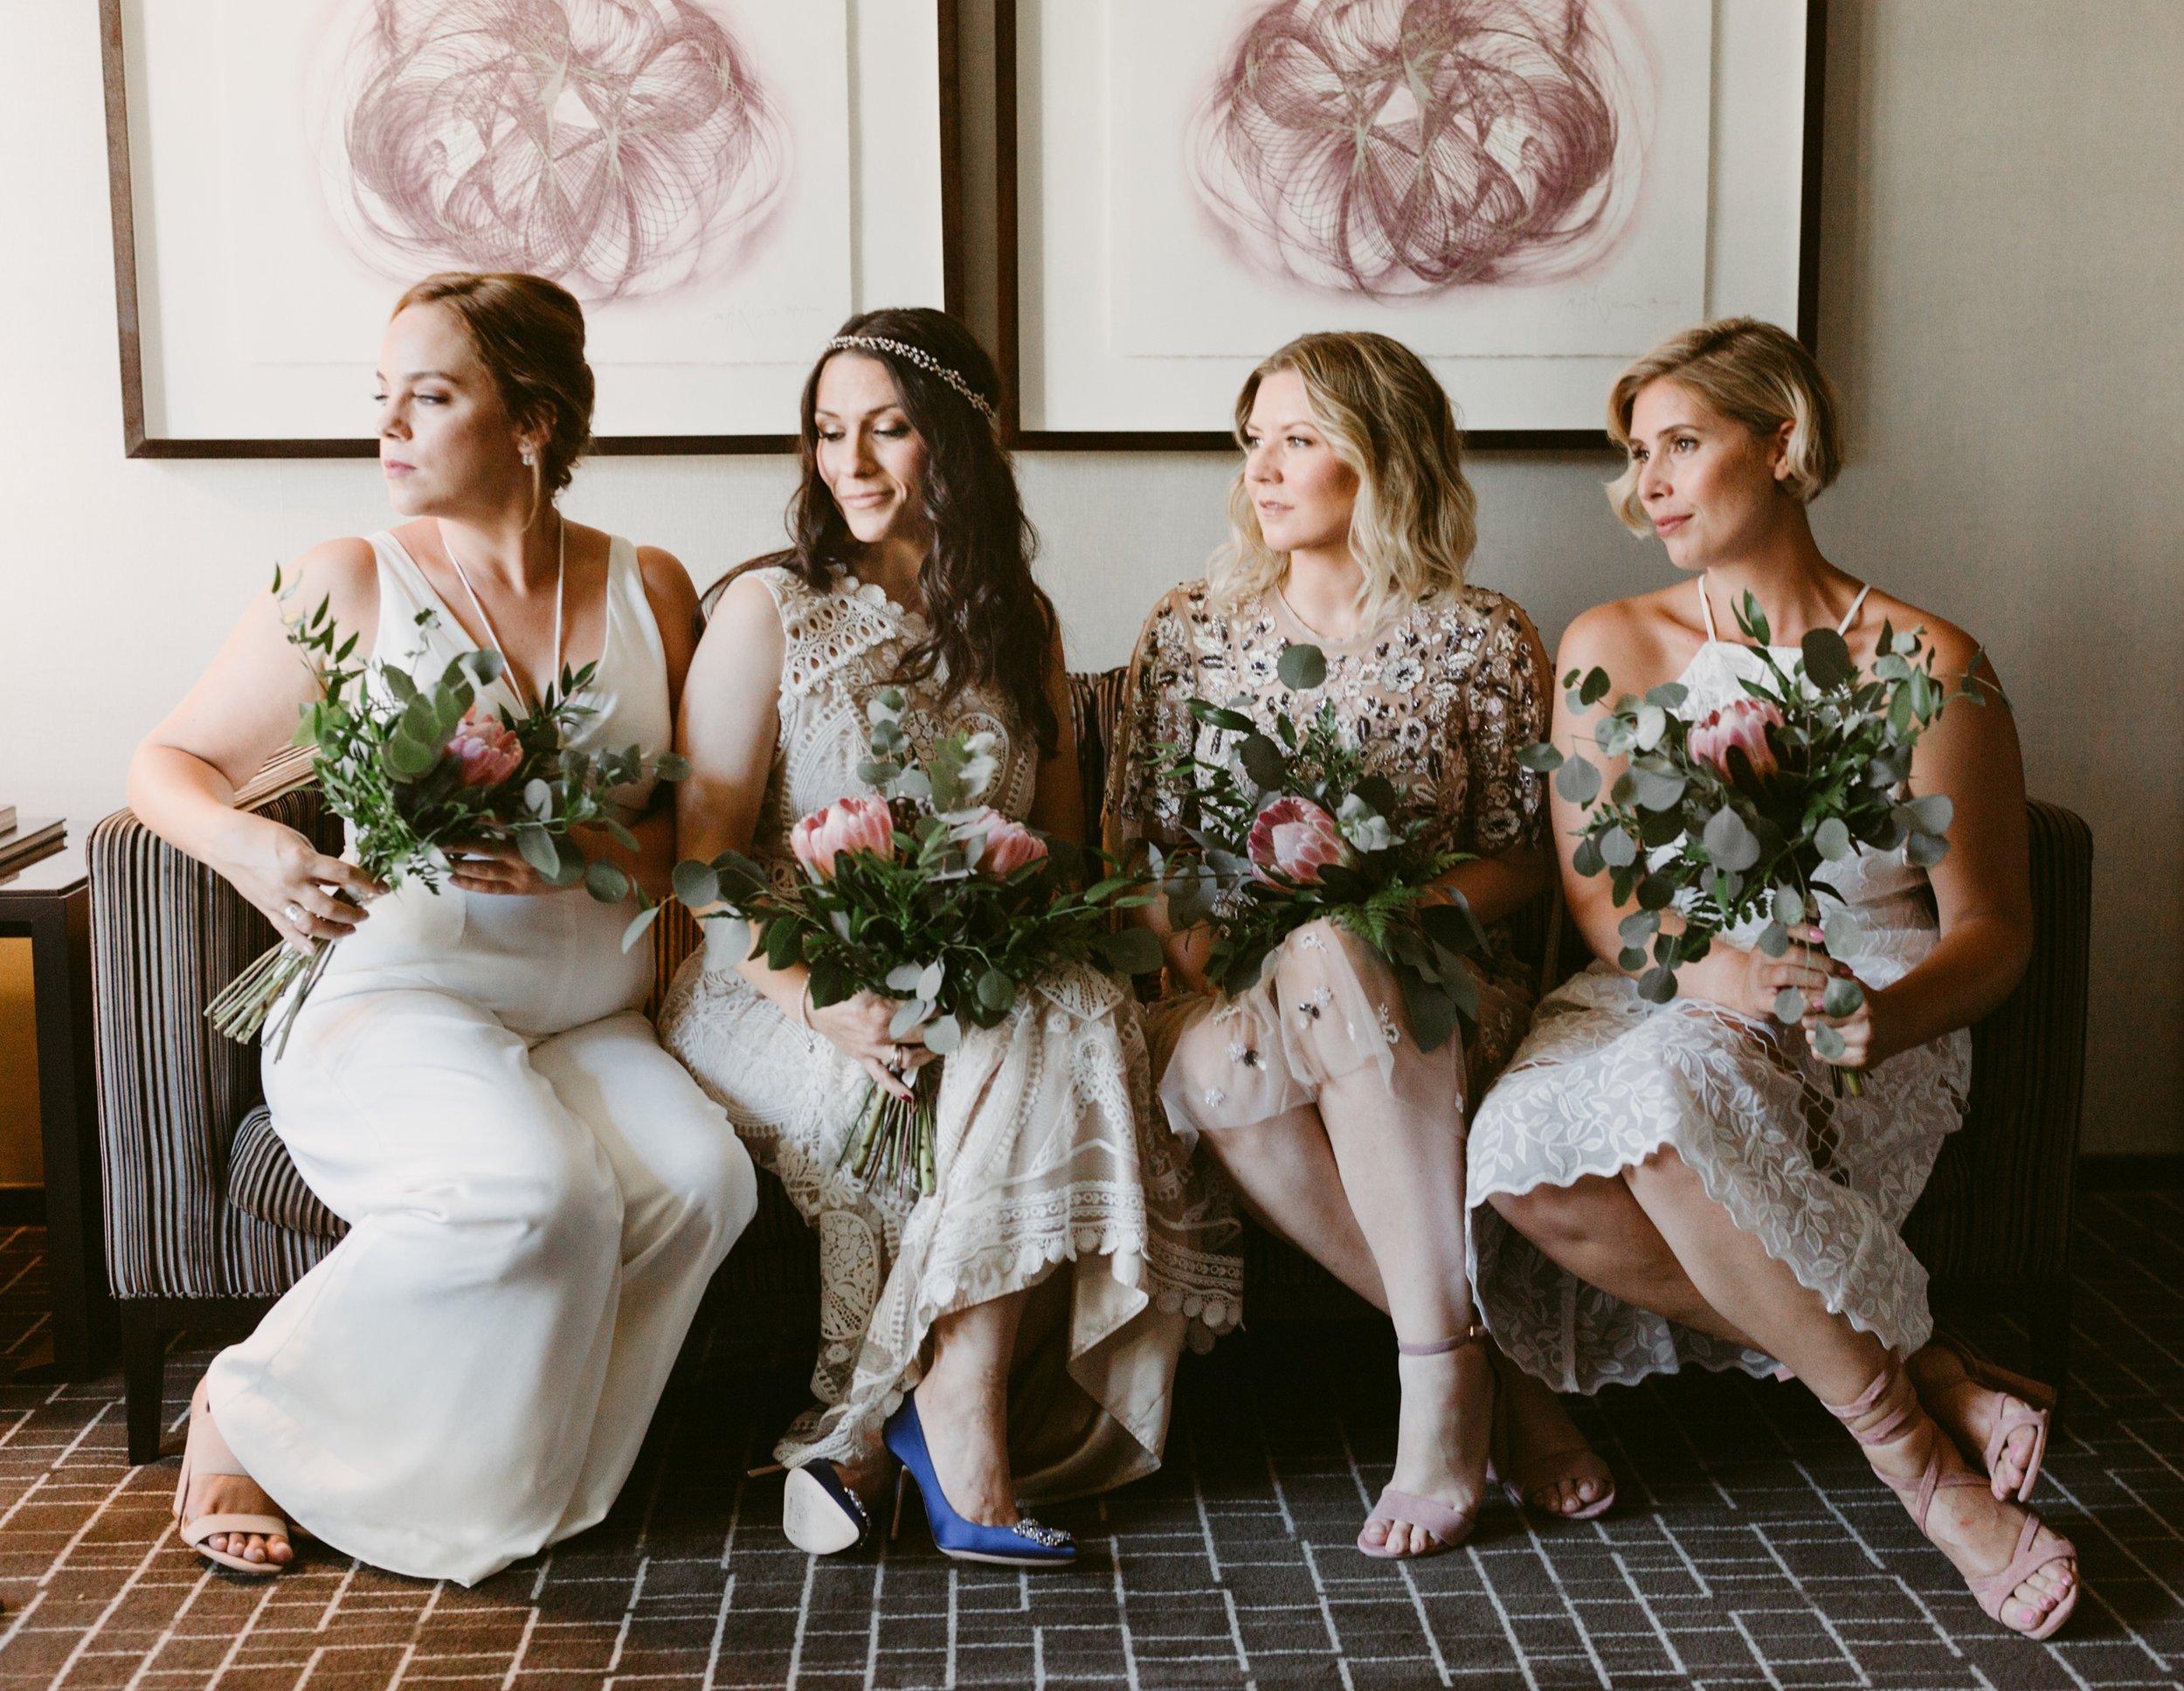 013_Spadina House Wedding (67 of 748)_House_Spadina_intimate_Toronto_Wedding.jpg